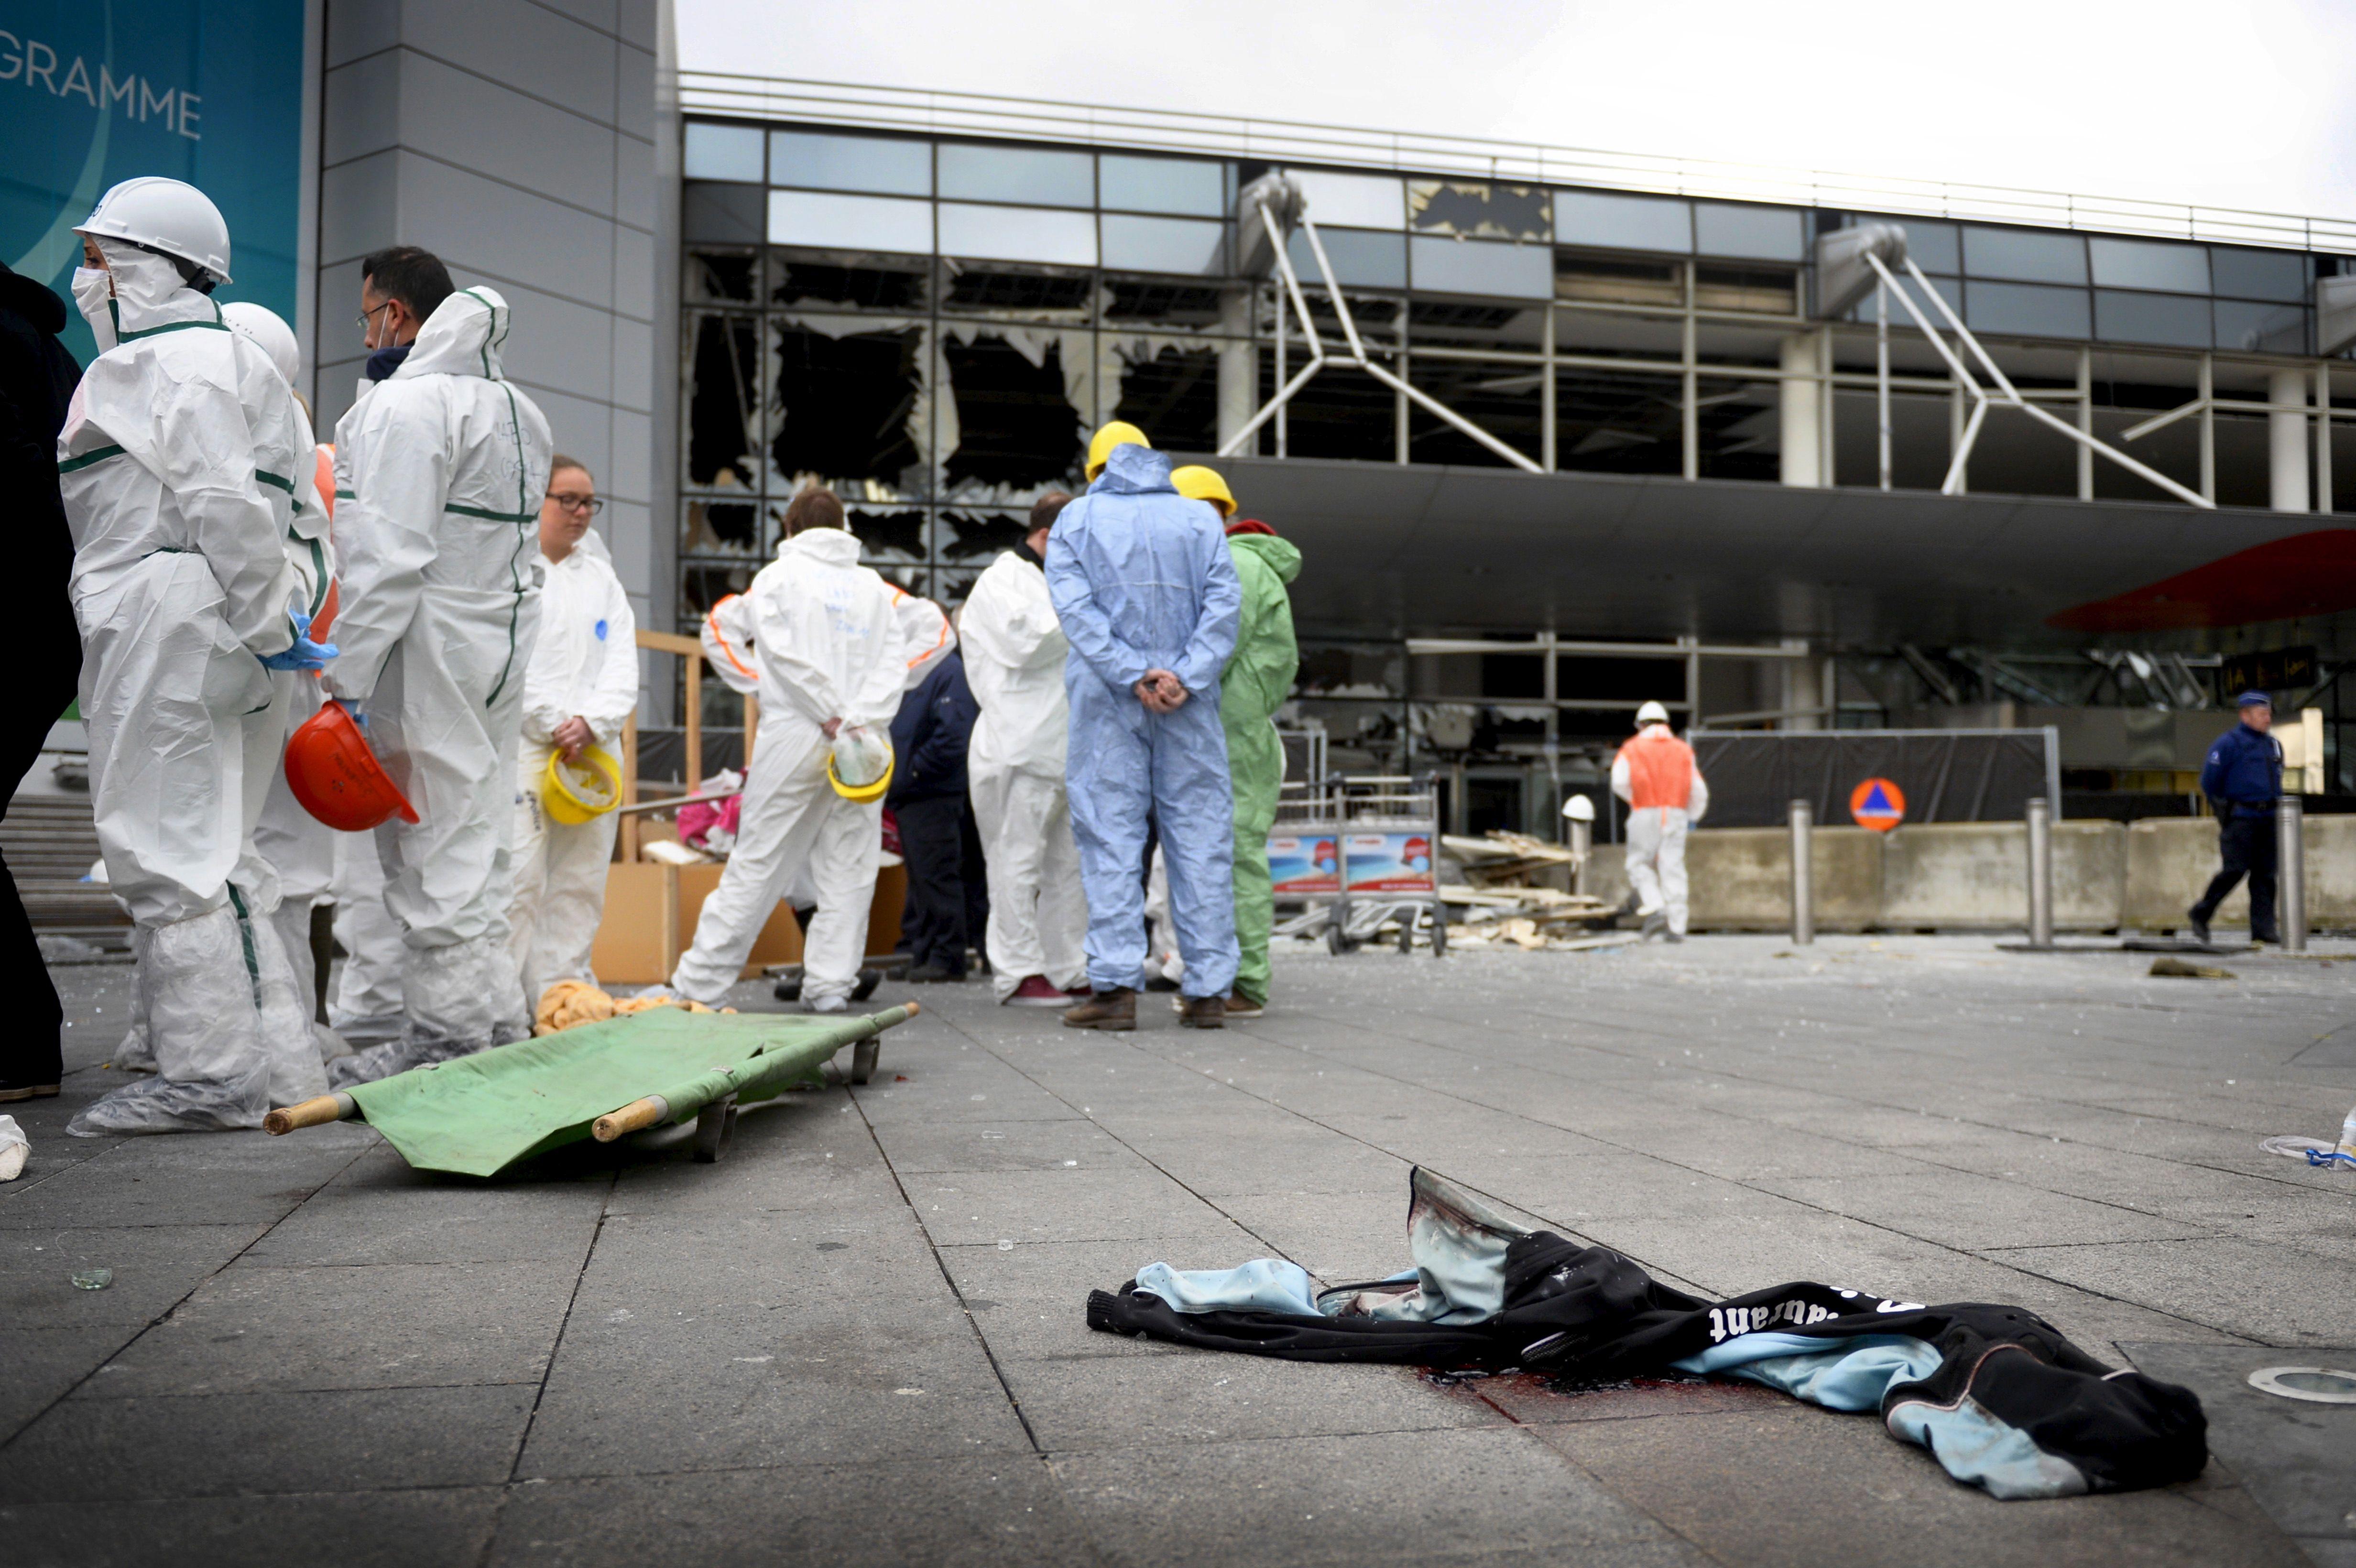 Attentats de Bruxelles : qui s'en est félicité?